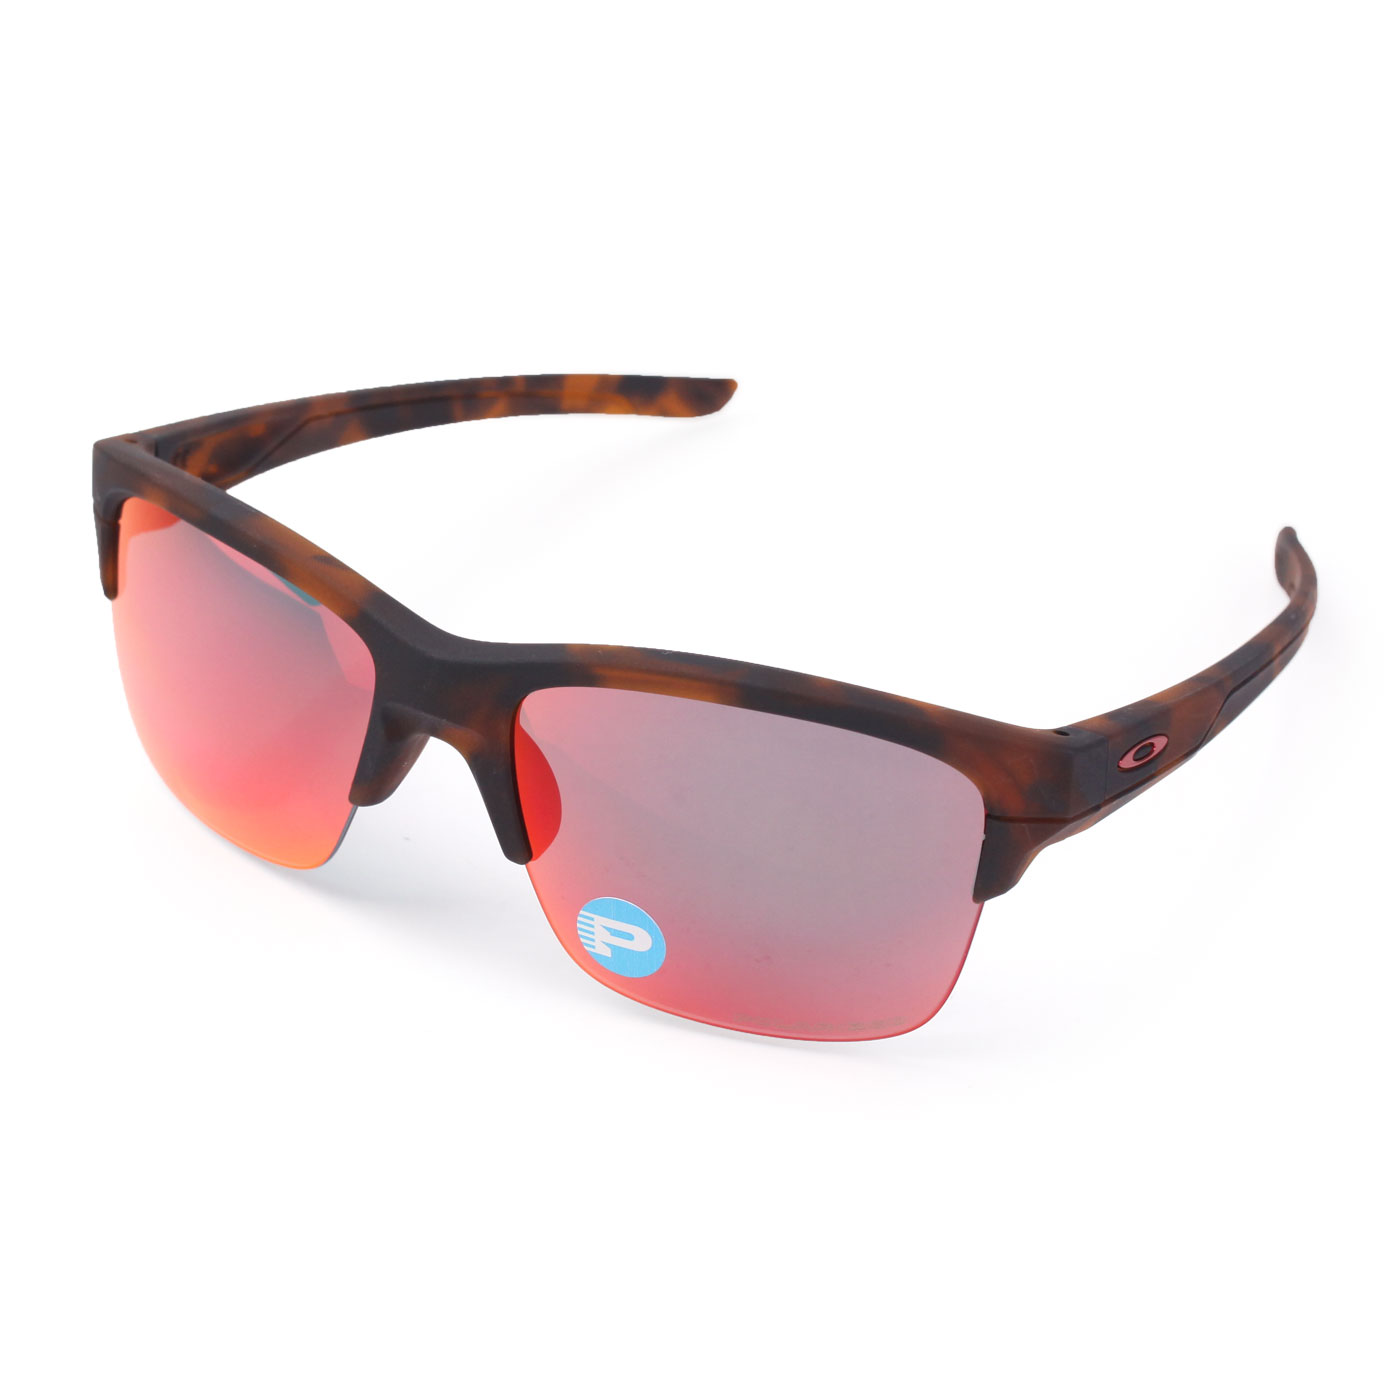 OAKLEY THINLINK  偏光運動休閒兩用太陽眼鏡 (附鏡袋無鼻墊) OAK-OO9317-06